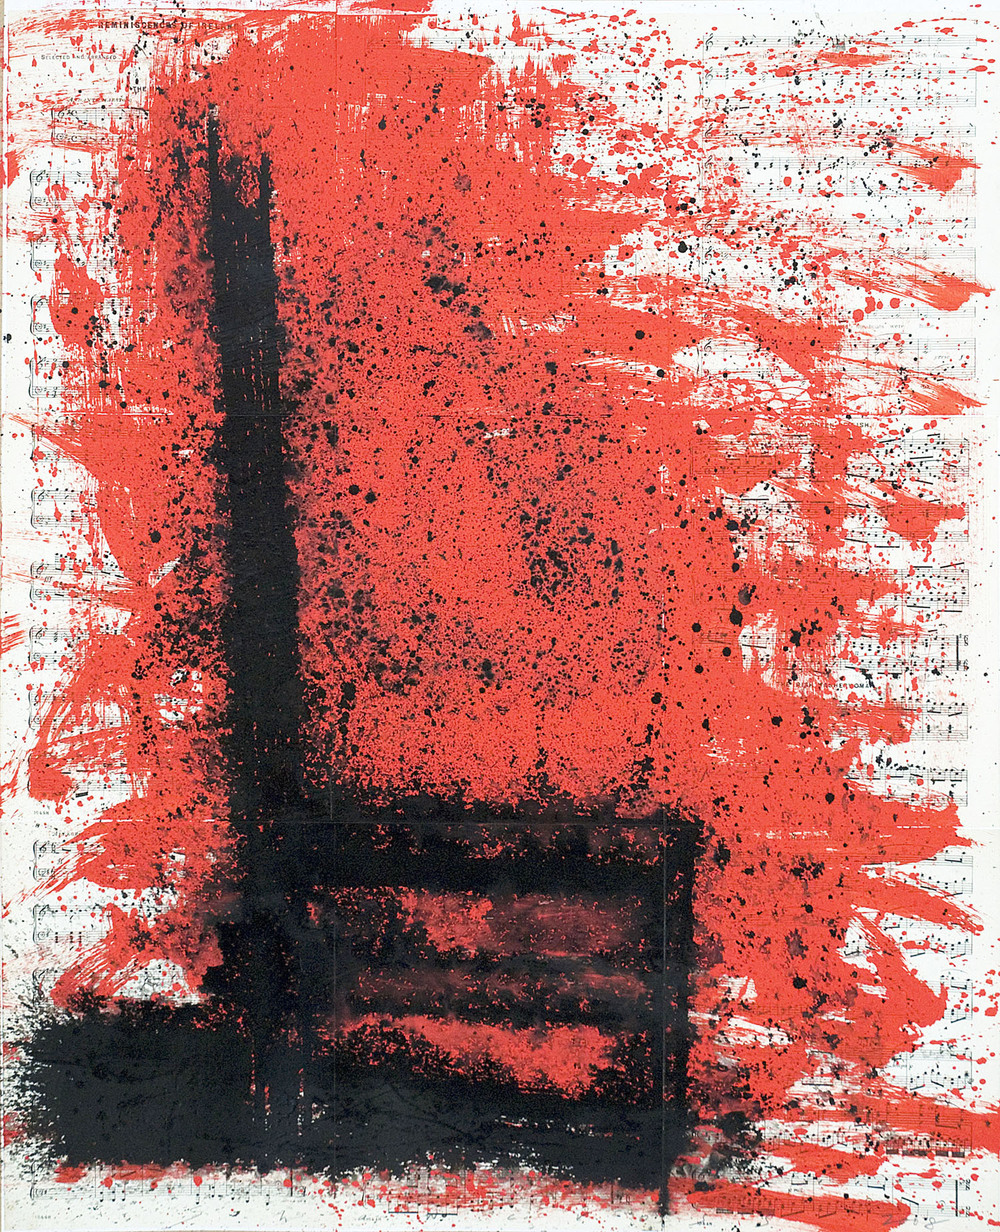 Neil Shawcross_2007_Chair #17_acrylic on paper_91.5 x 74cm.jpg